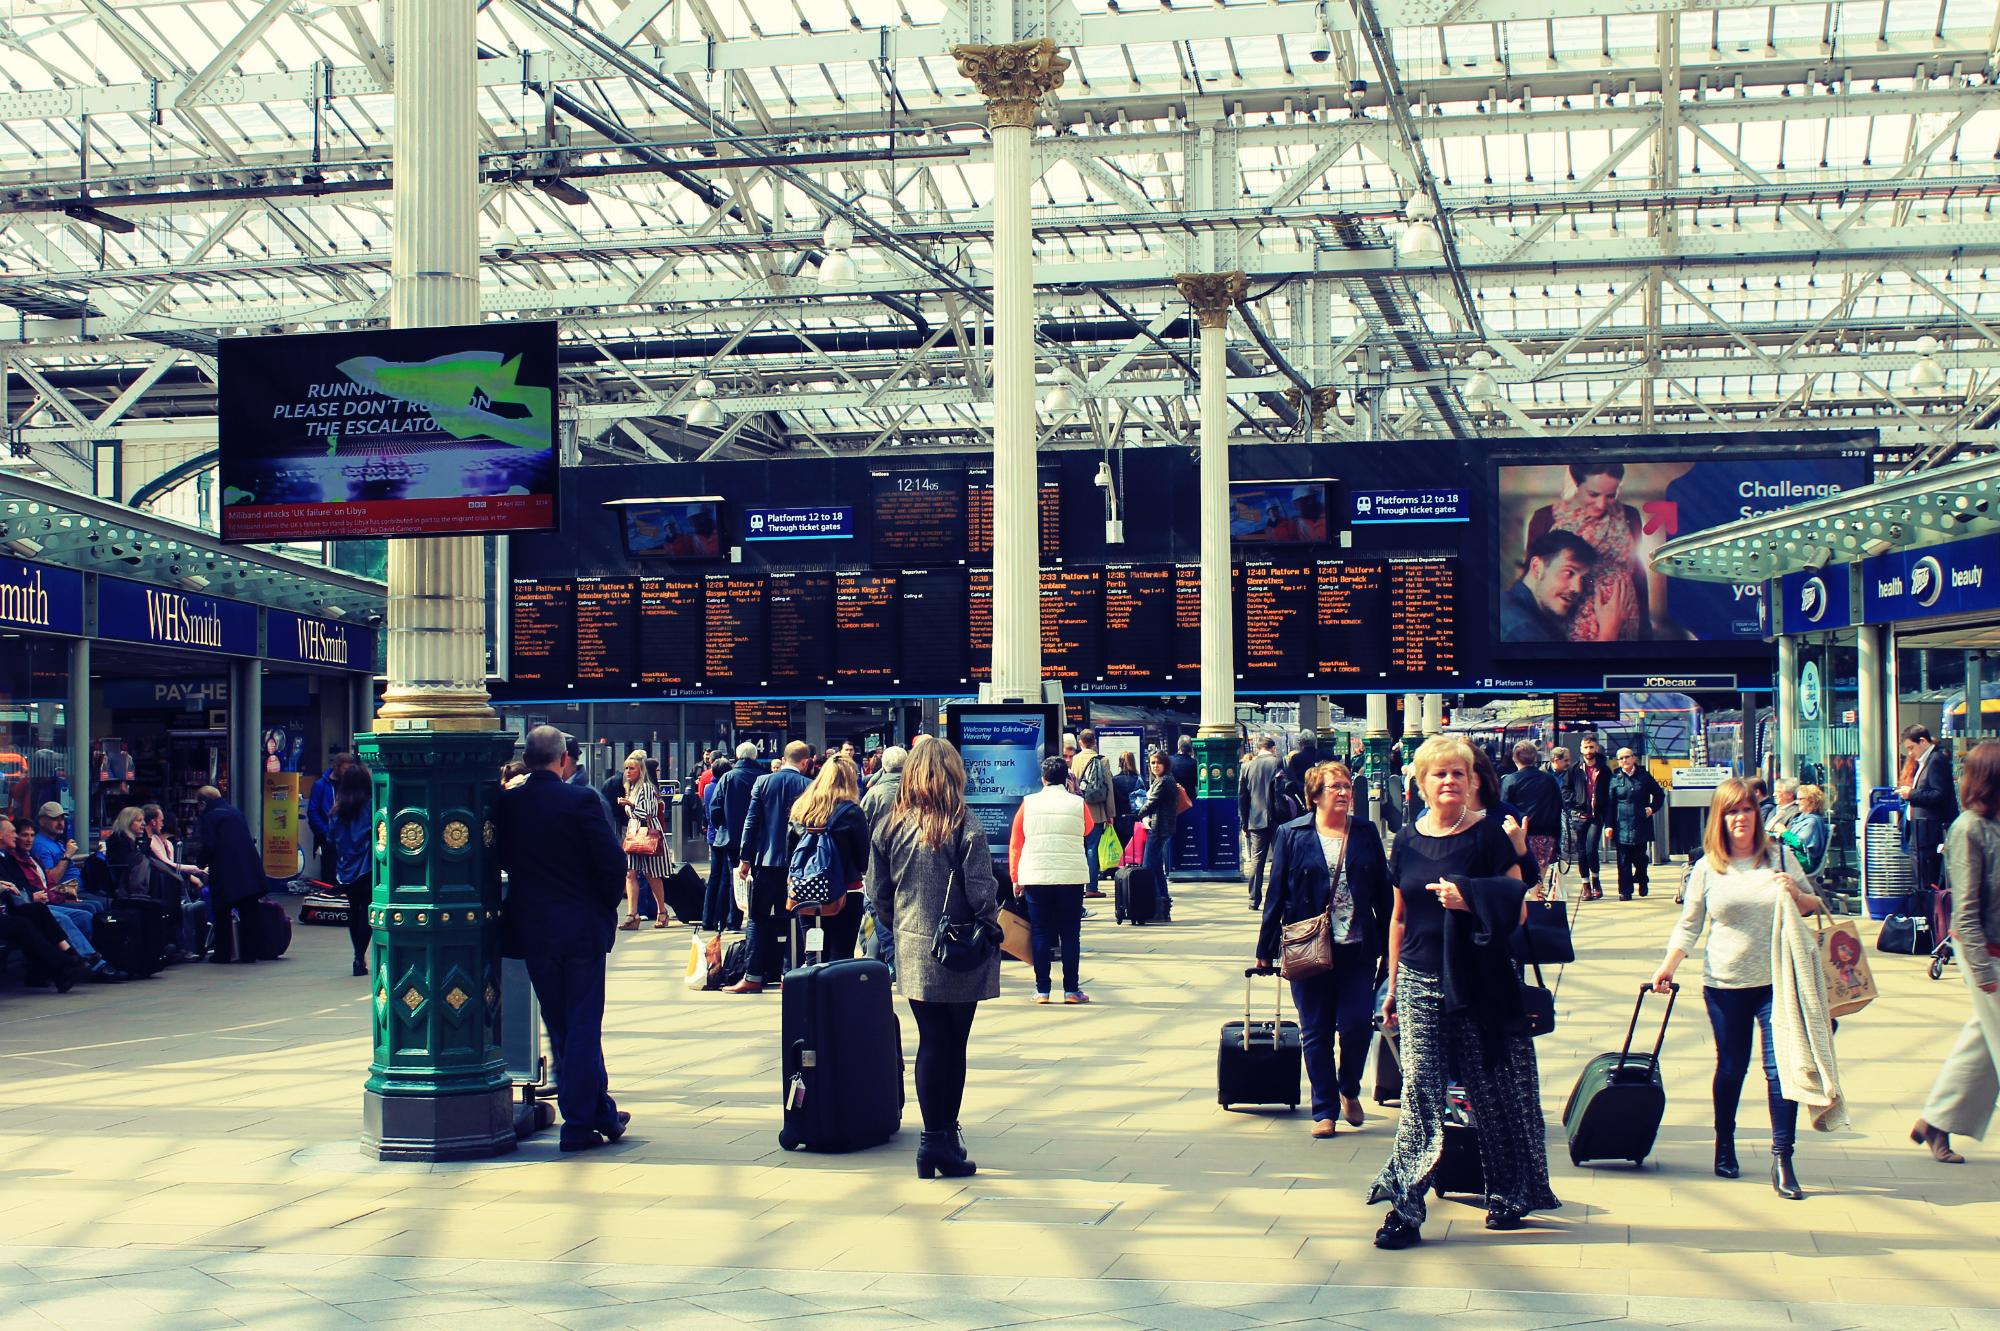 Edinburgh Waverley station